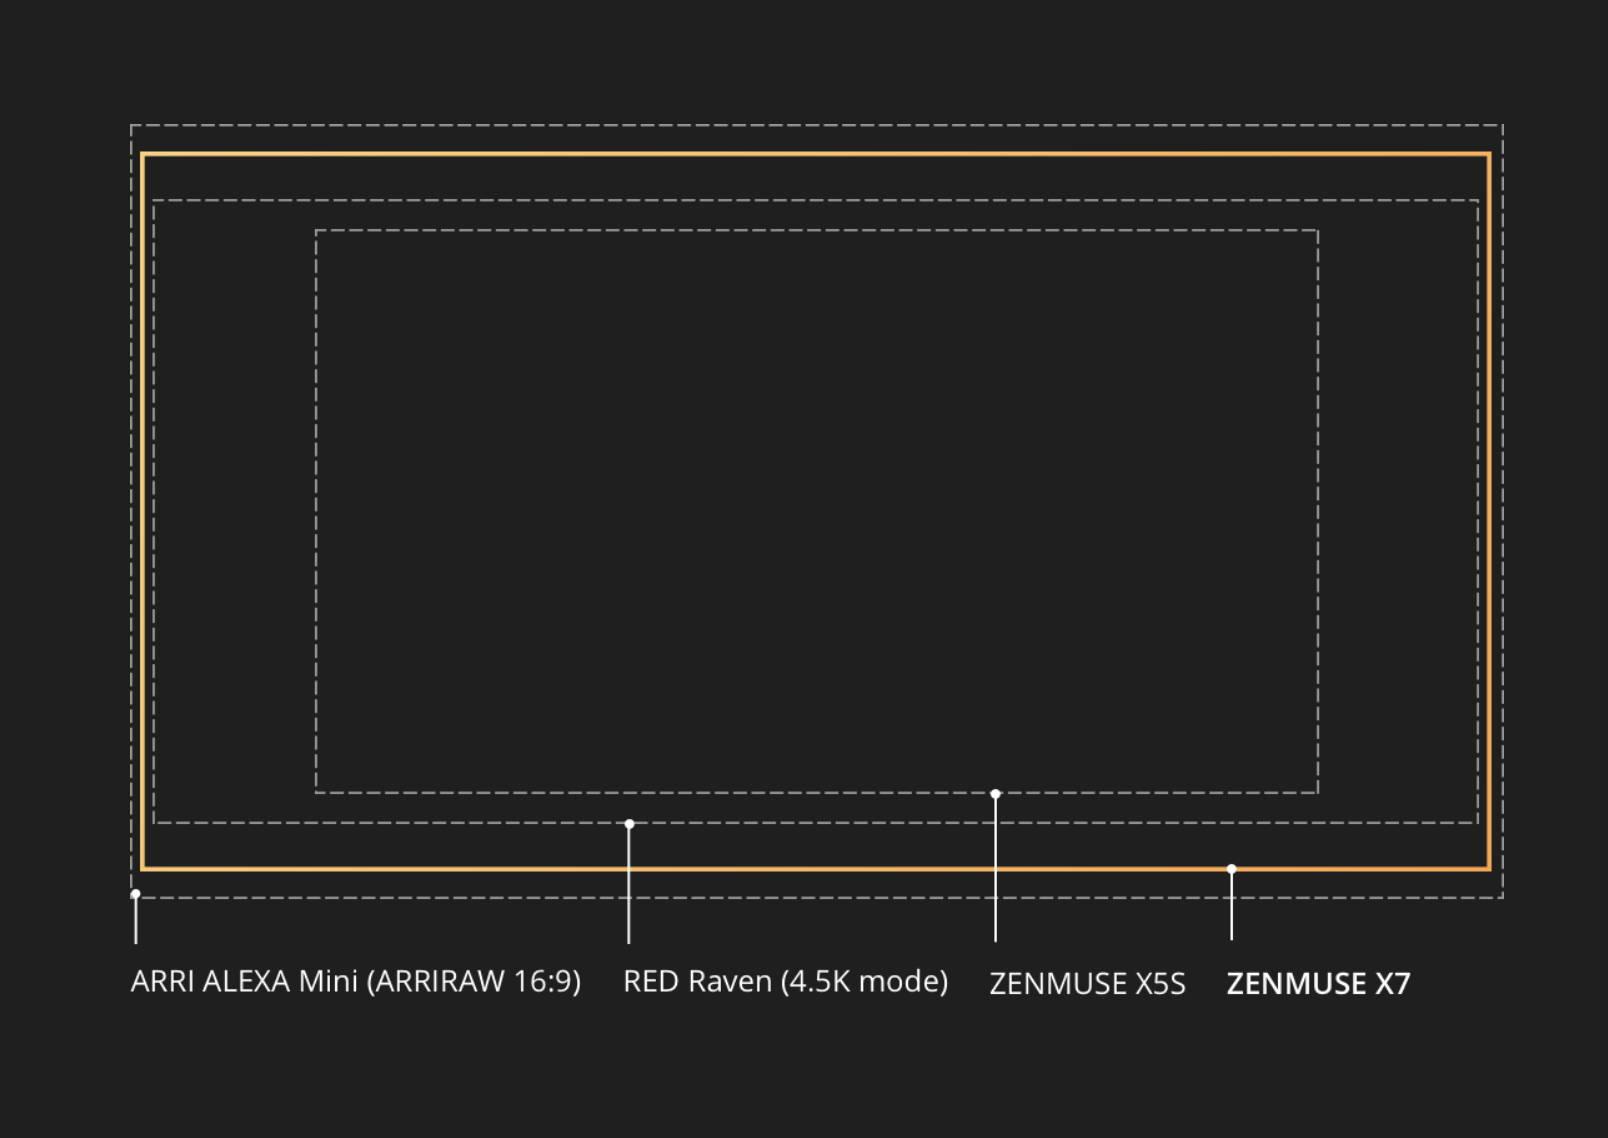 Zenmuse X7 Super 35 Sensor